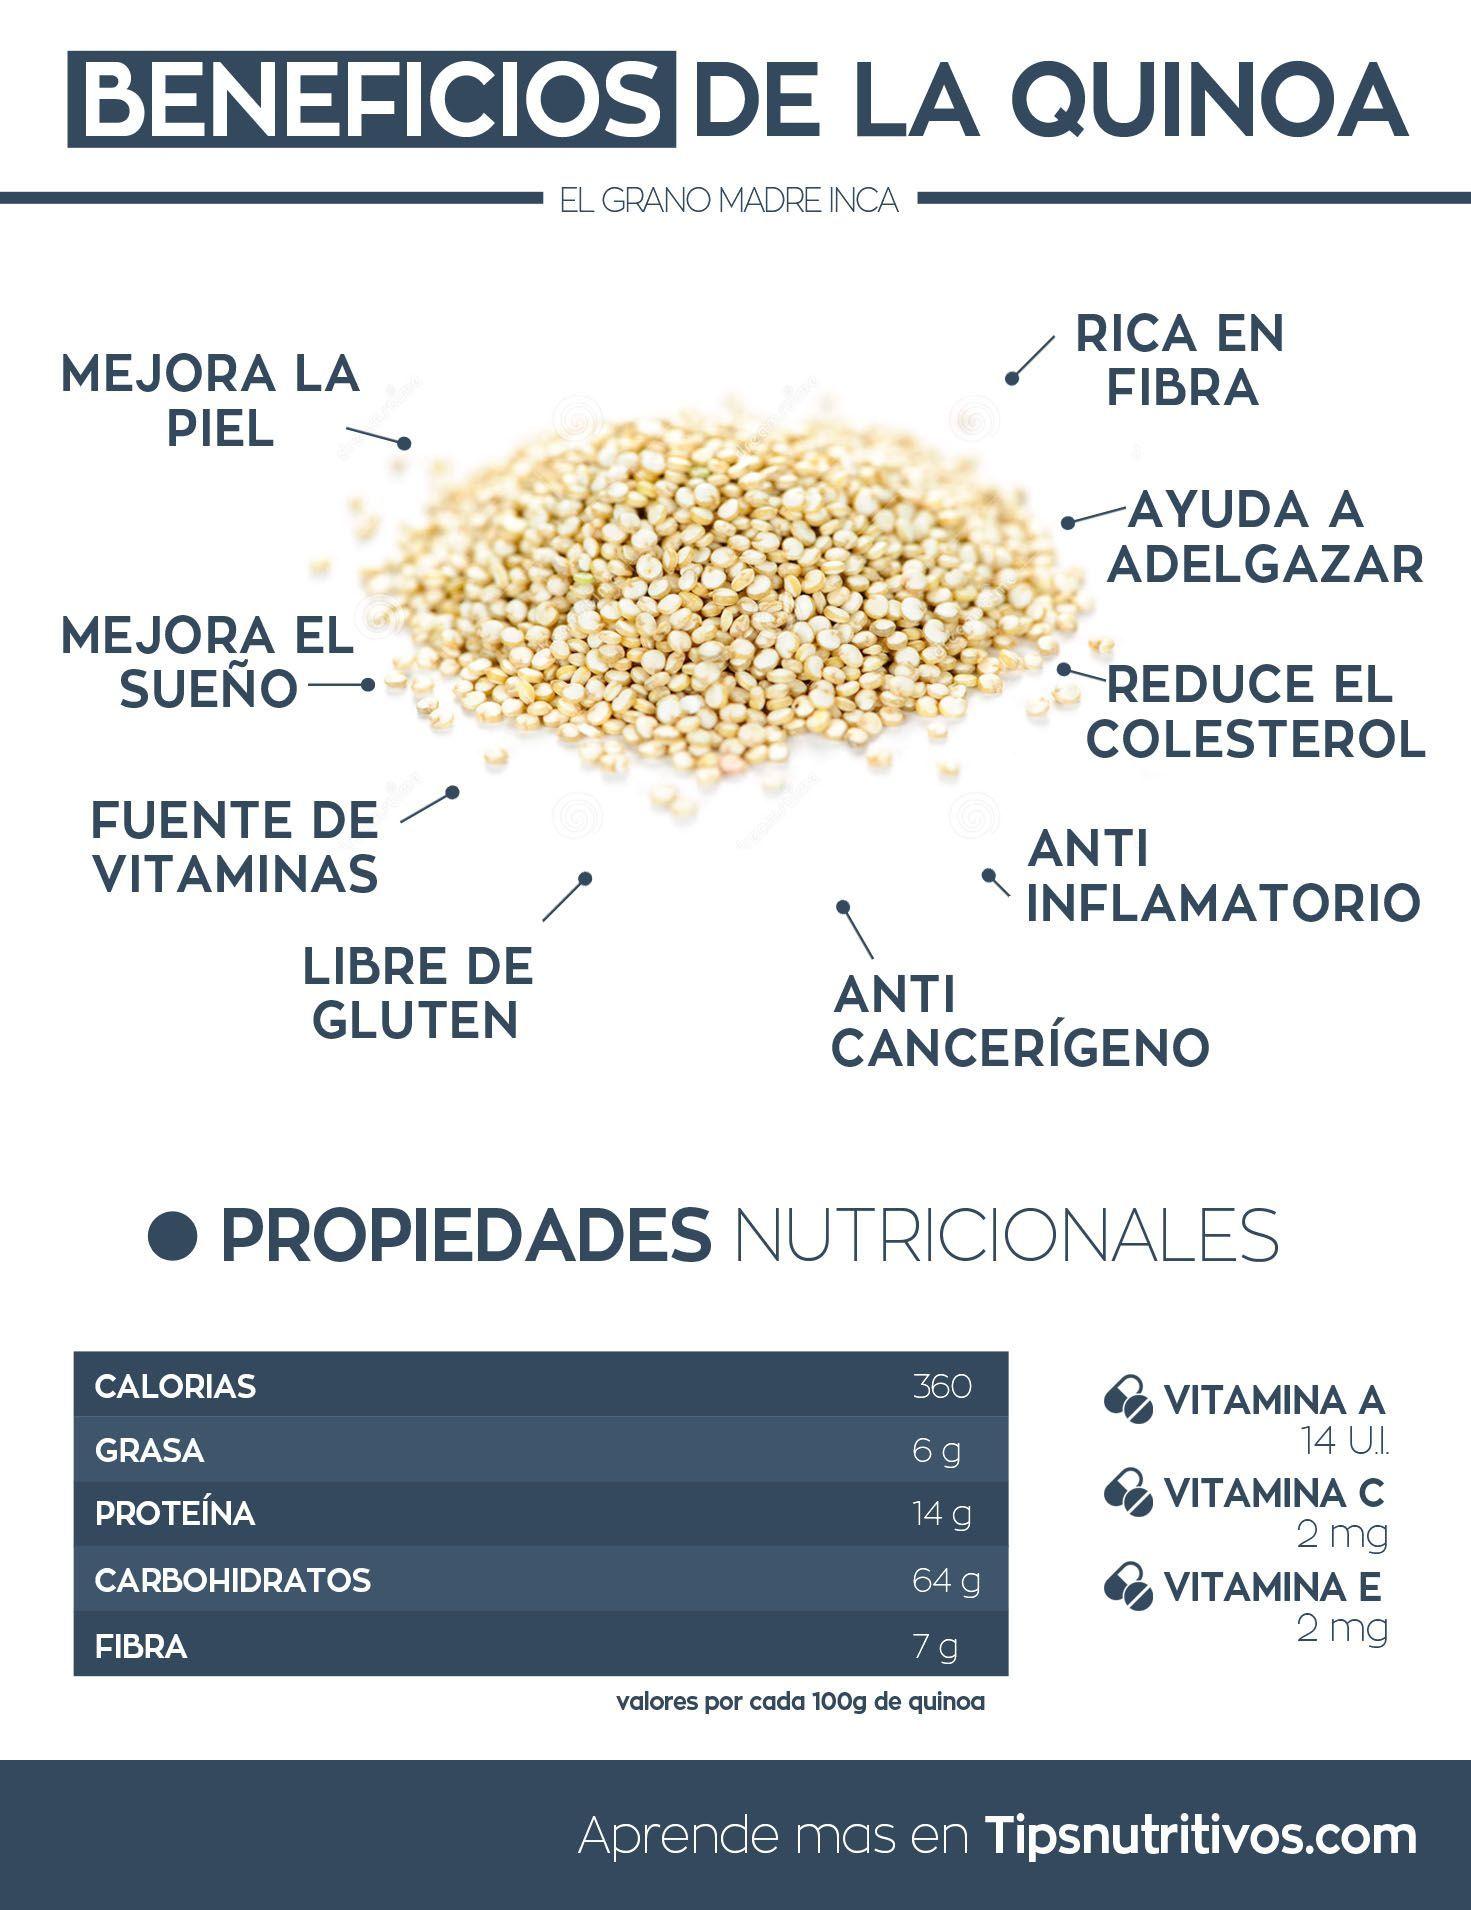 Infografia Beneficios De La Quinoa Via Tips Nutritivos Recetas